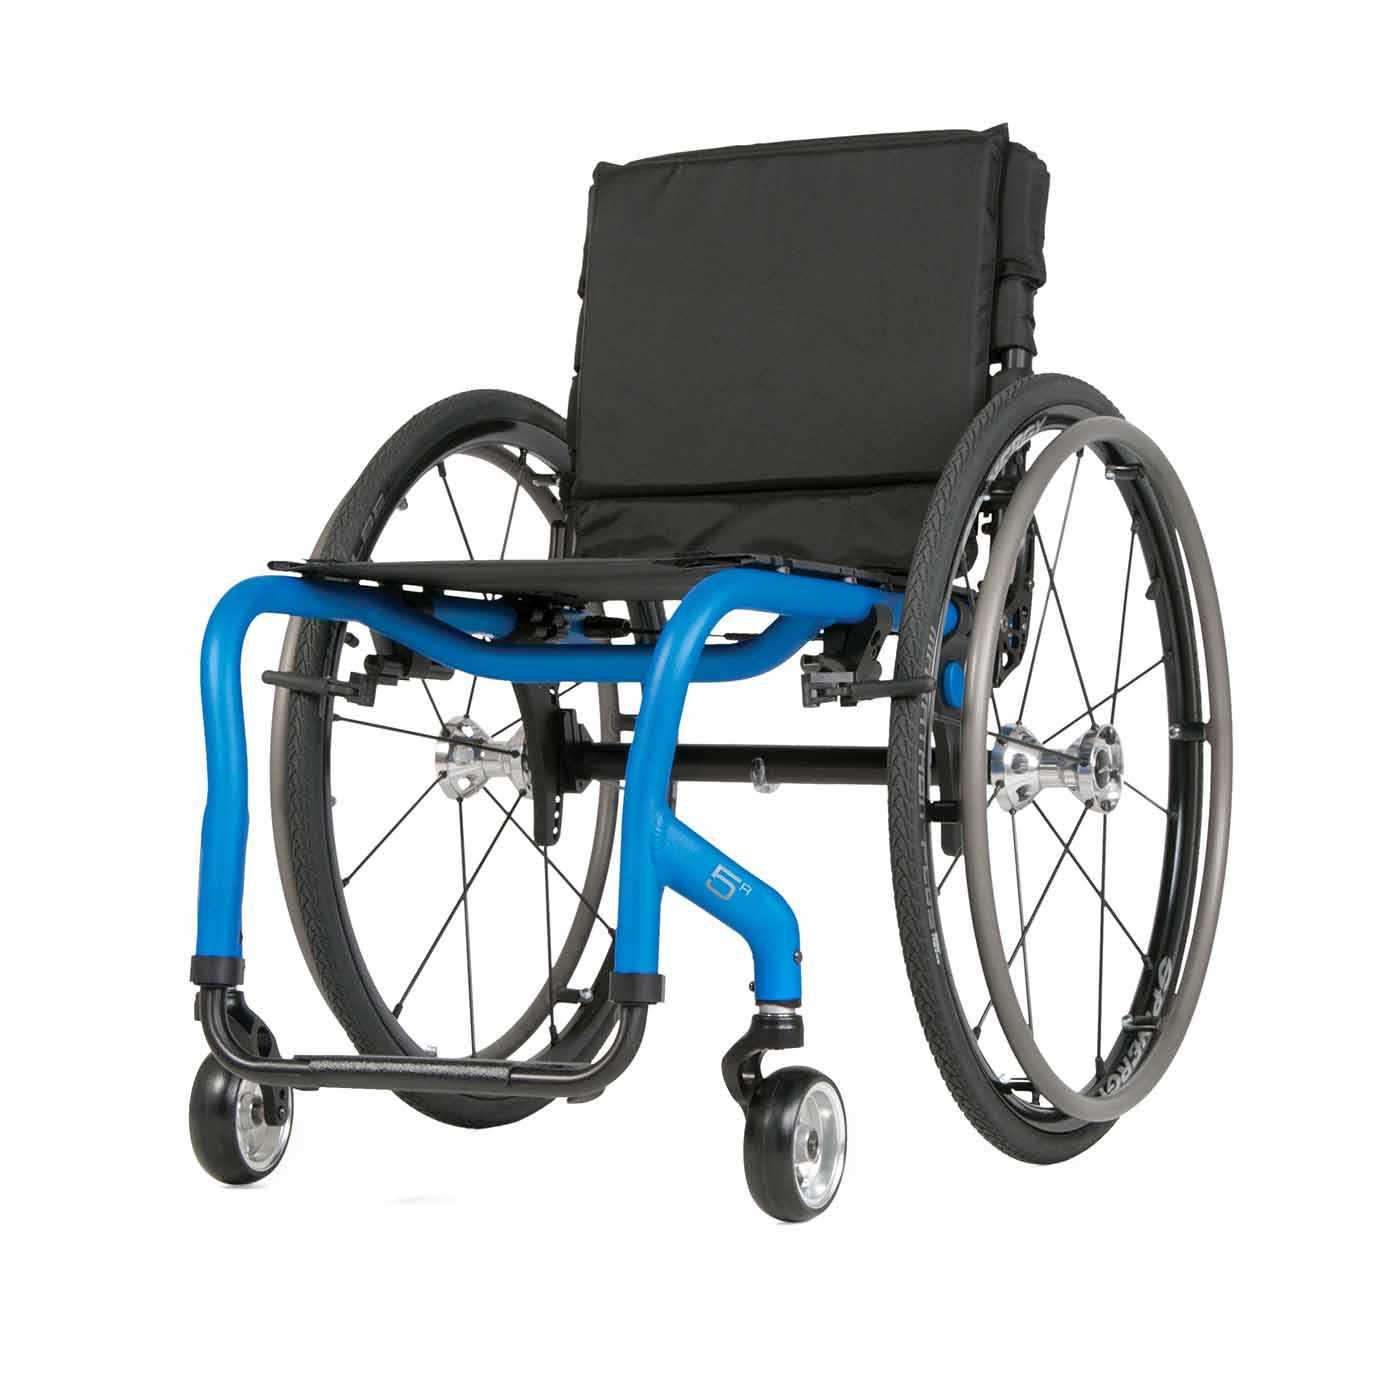 Quickie 5R rigid ultralight wheelchair